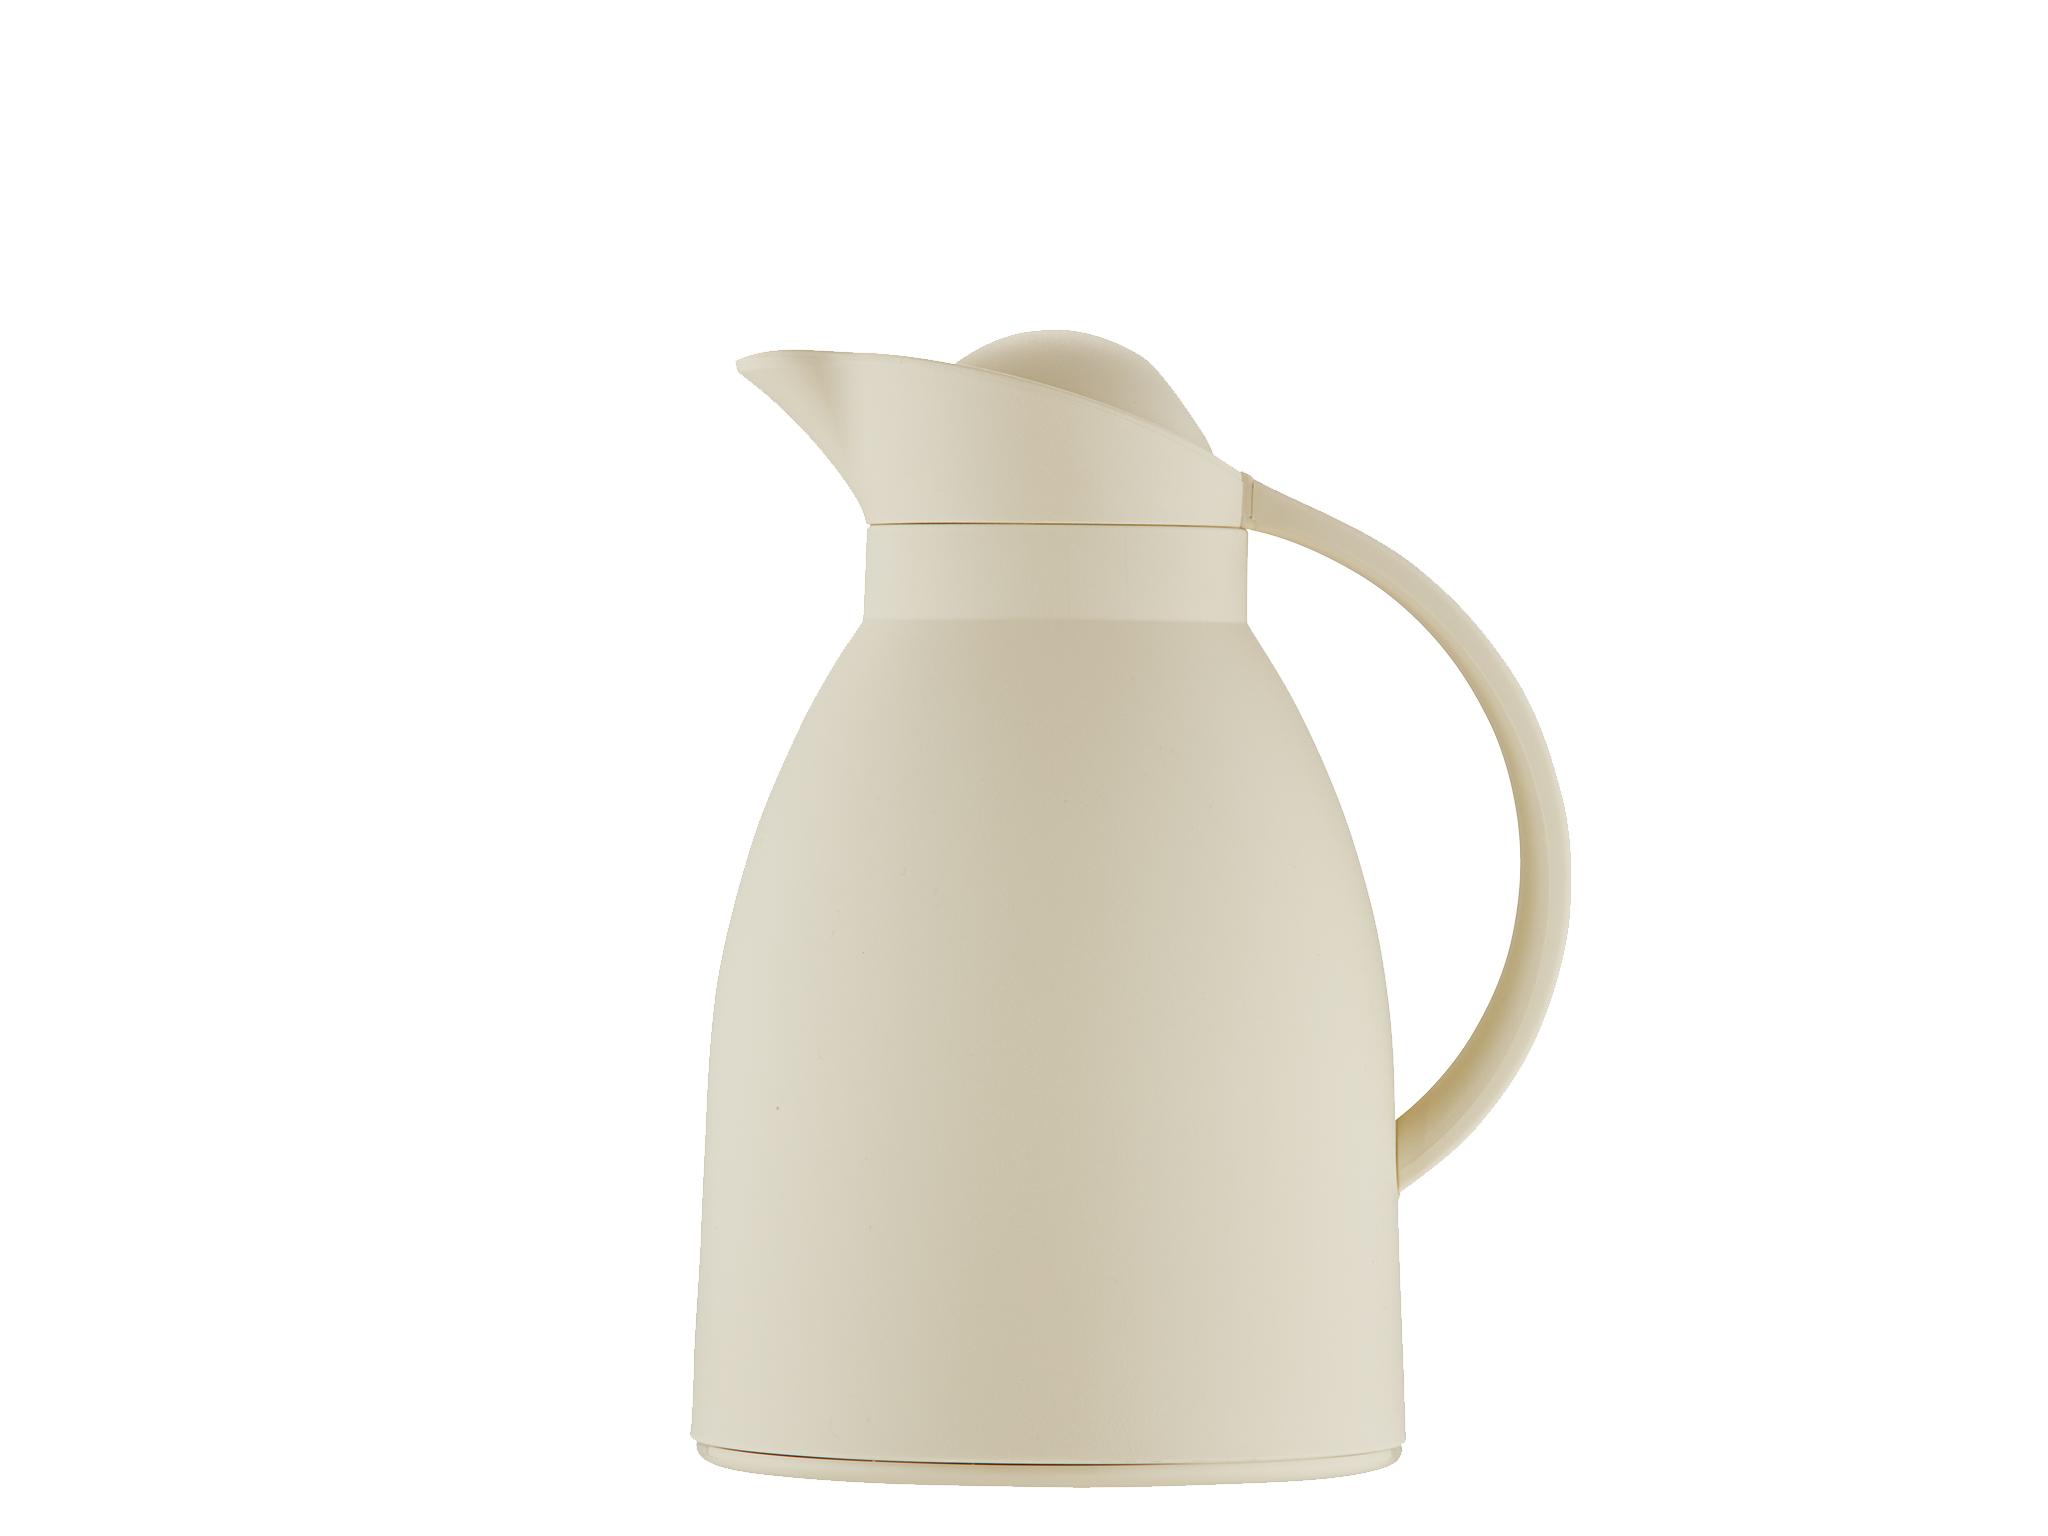 2894-128 - Vacuum jug 1.0 l Arabica RIO - Helios